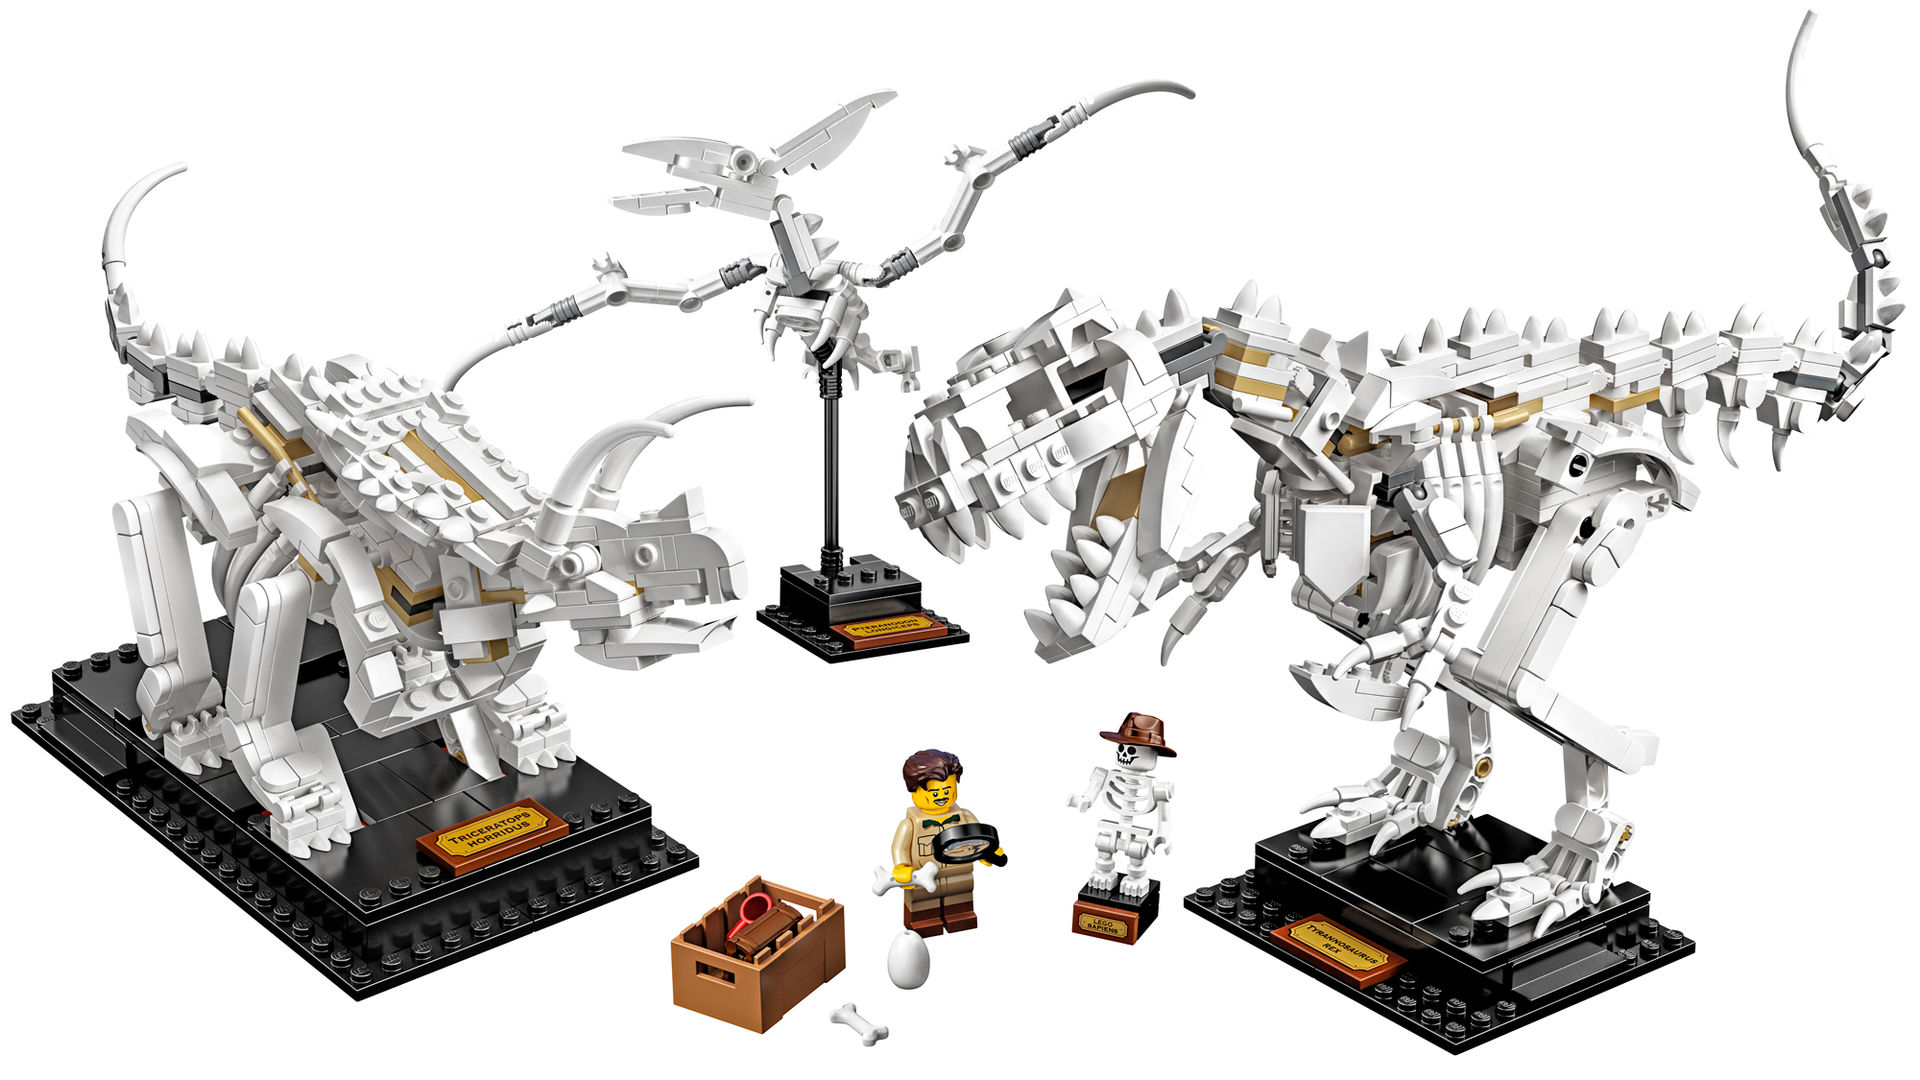 Nu kommer dinosaurie-skelett i Lego